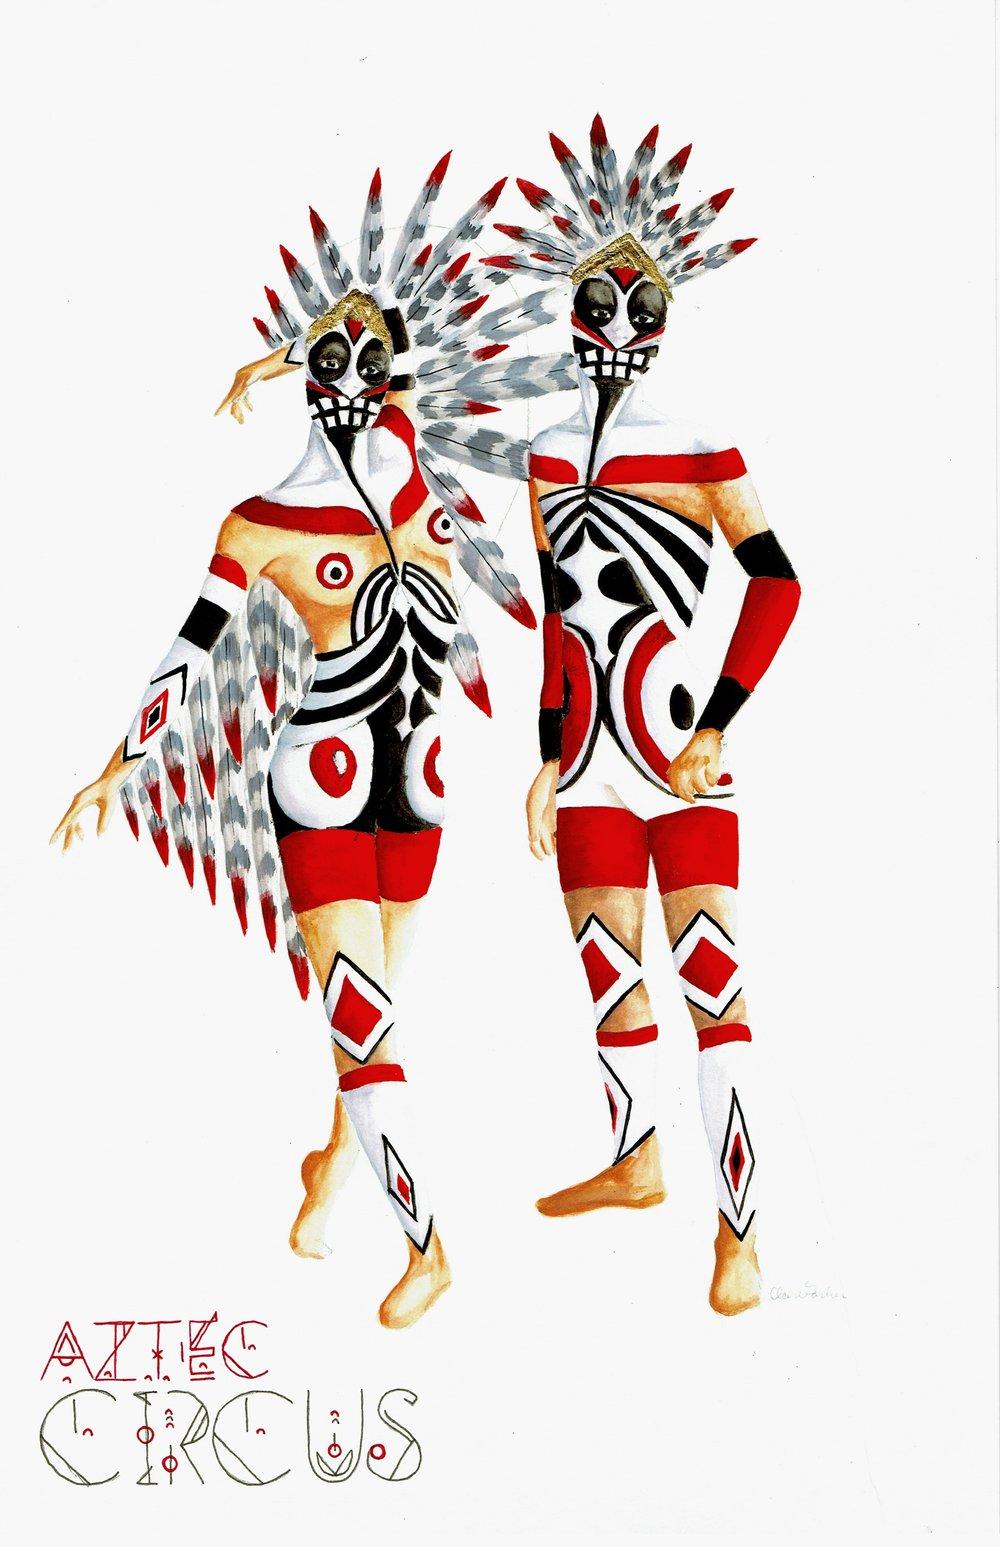 Aztec Circus Acrobats.jpg